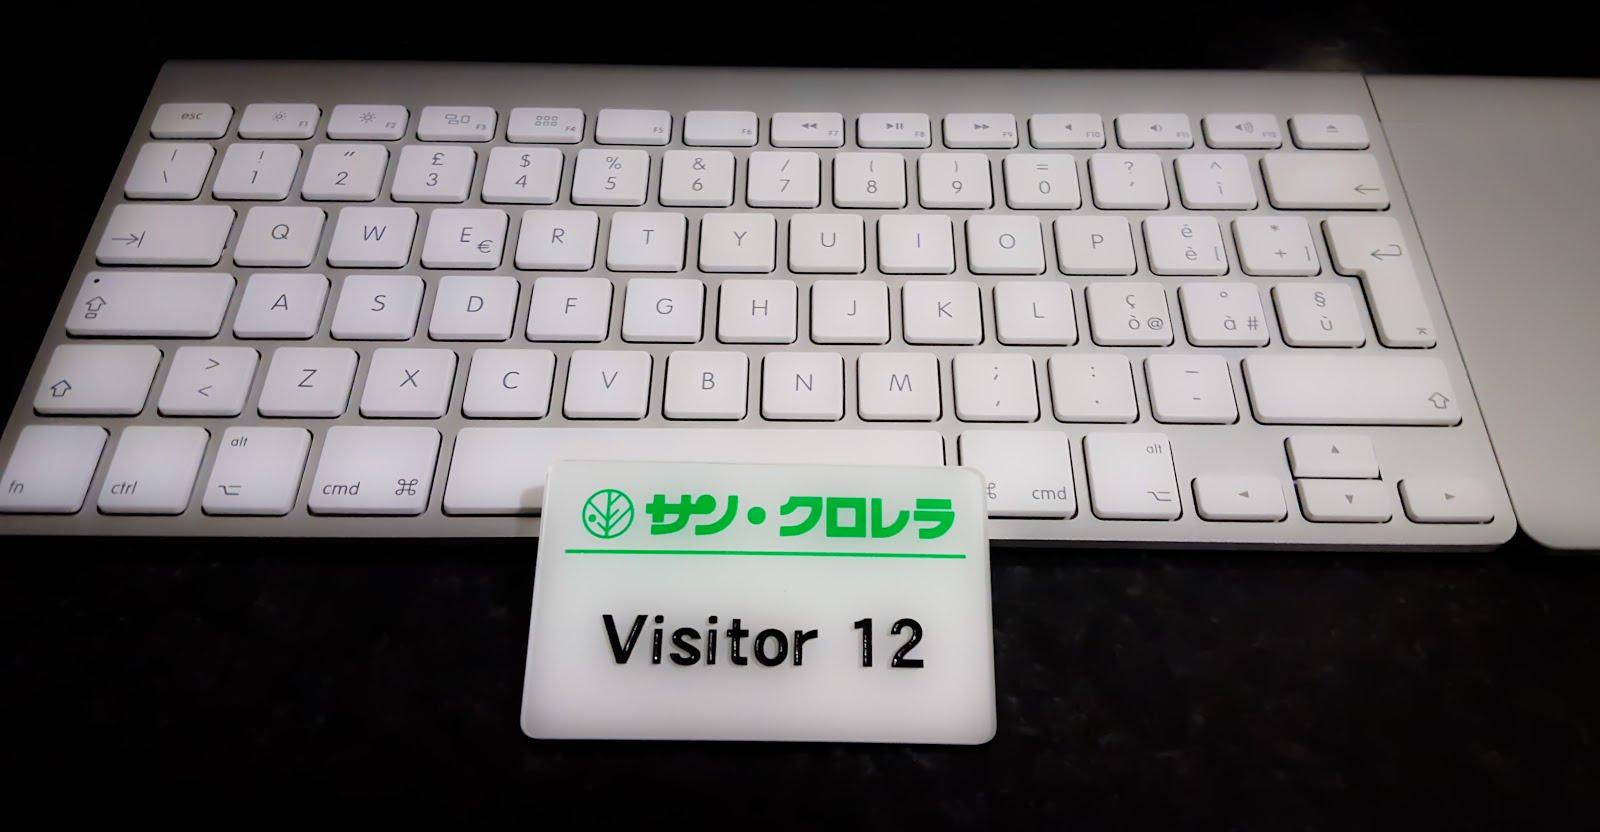 Visitor 12